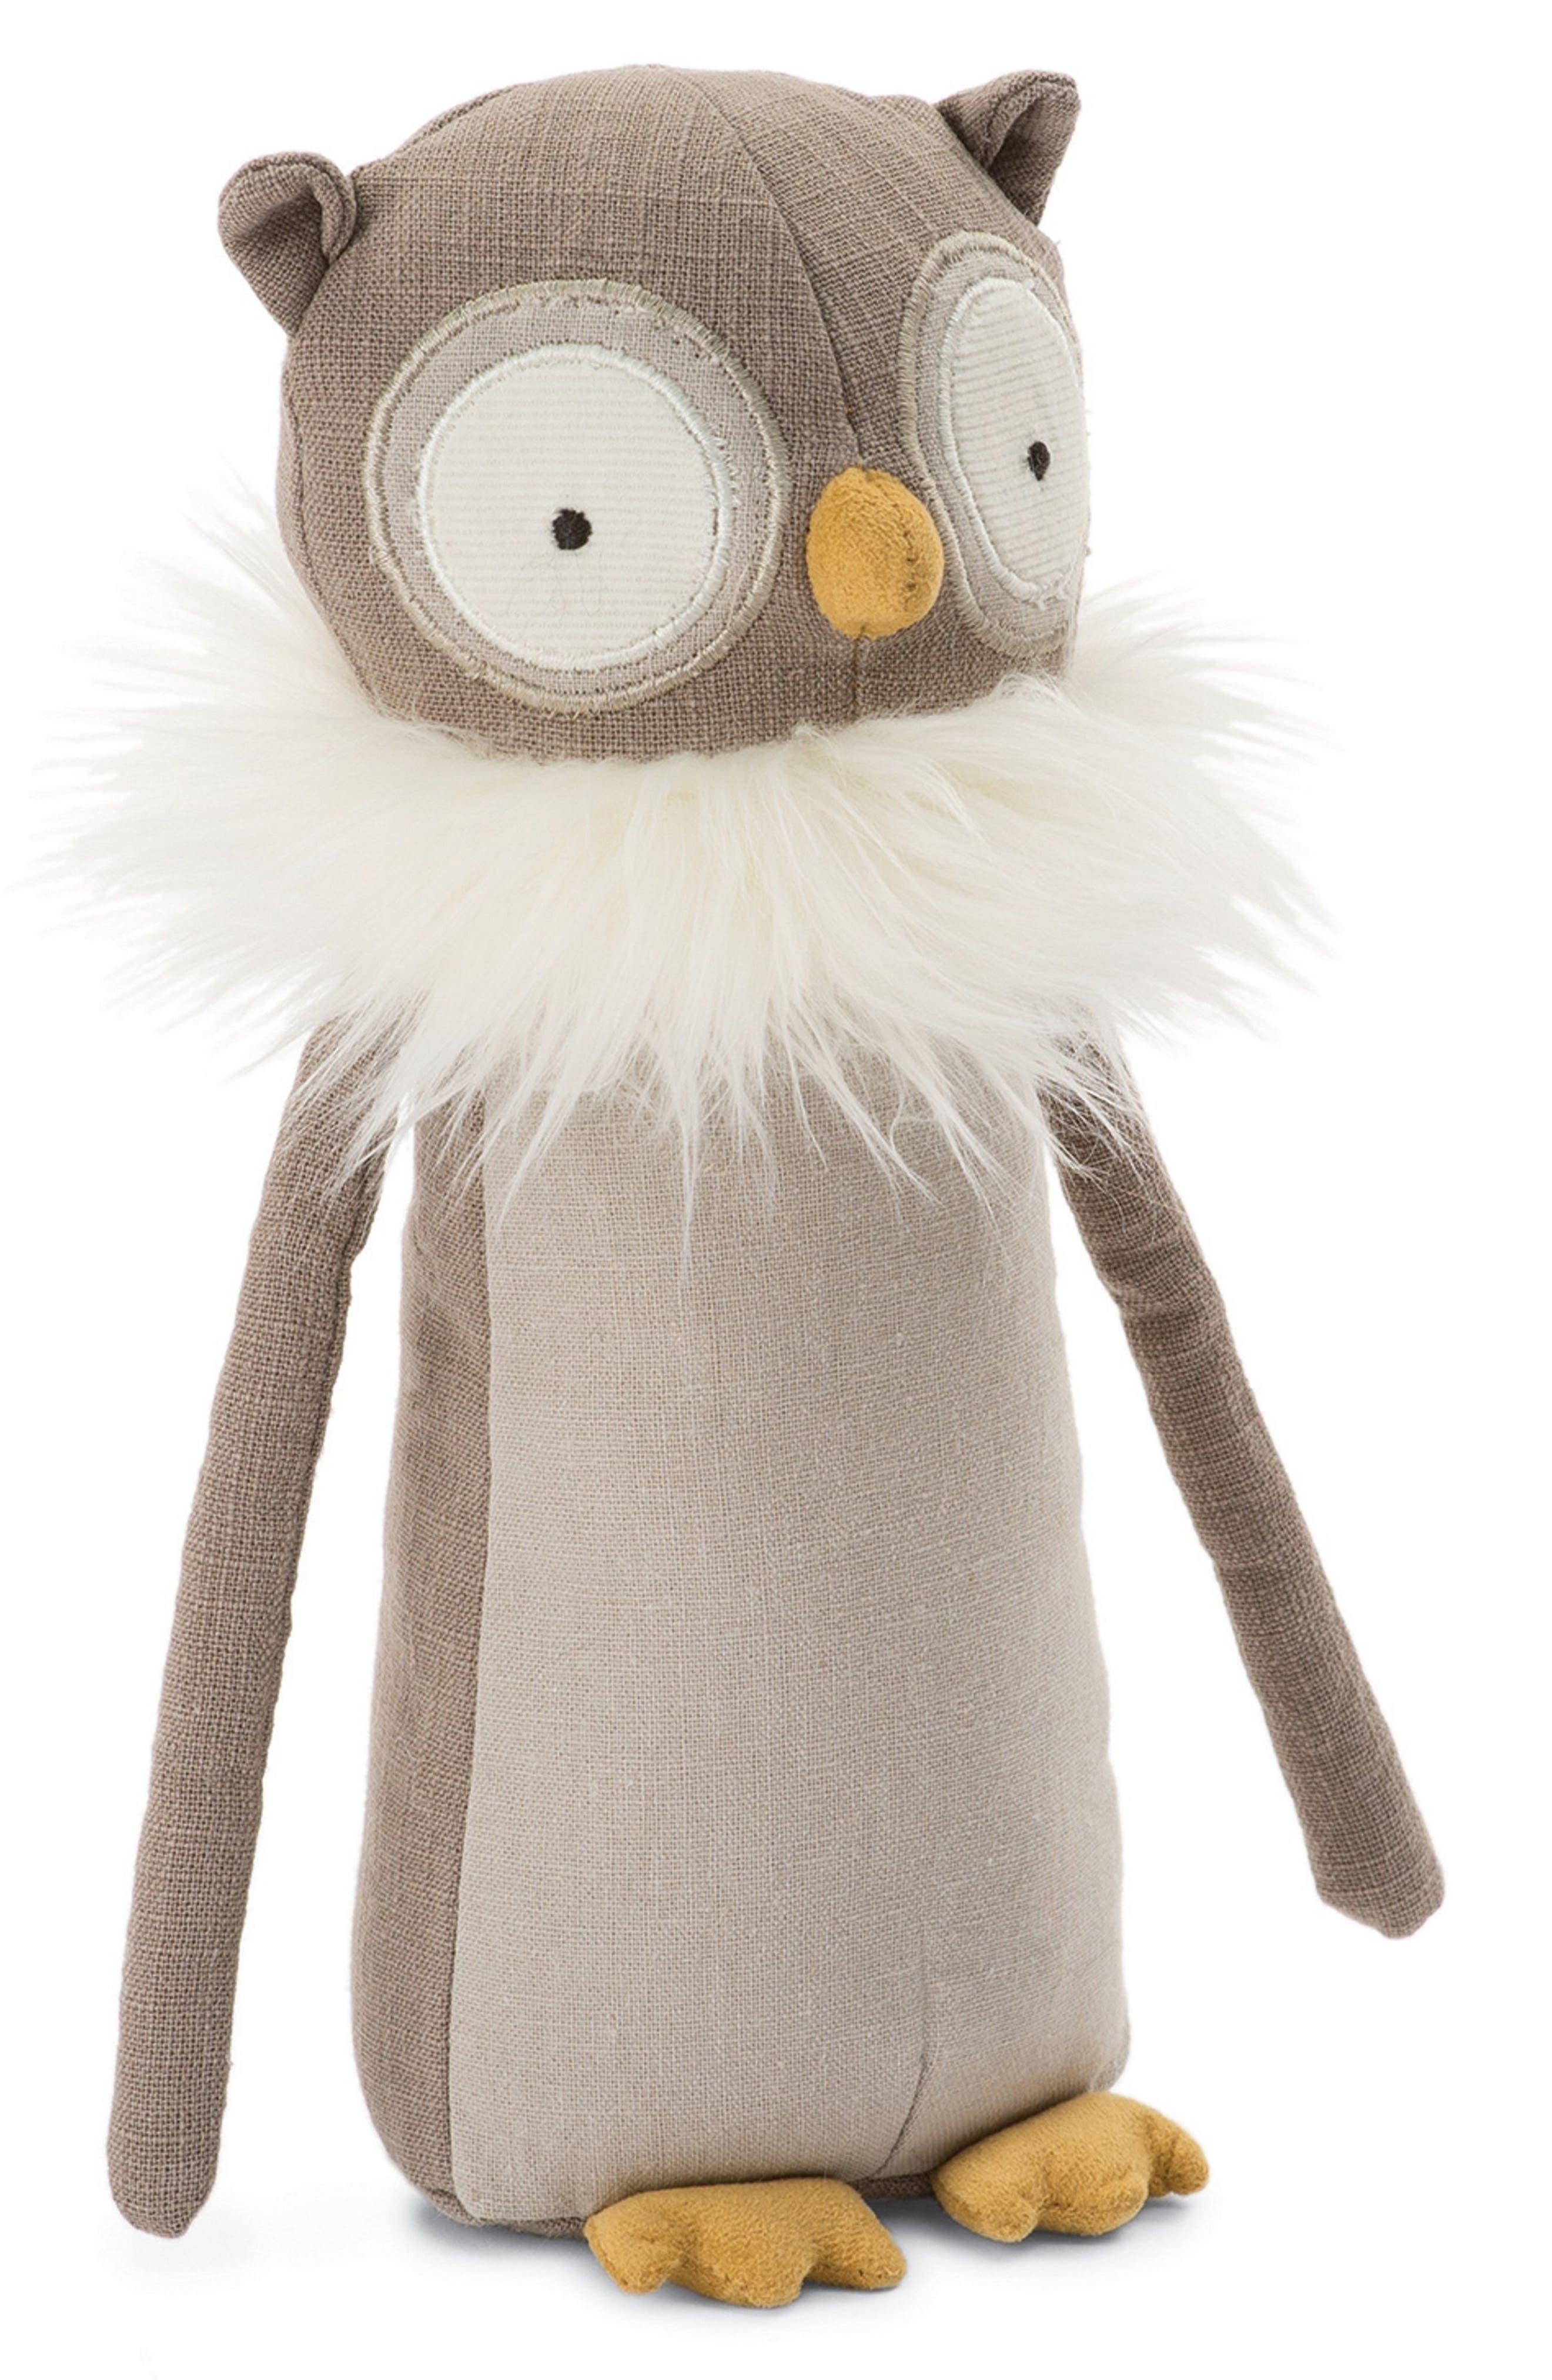 Alternate Image 1 Selected - Jellycat Skandoodle Owl Stuffed Animal